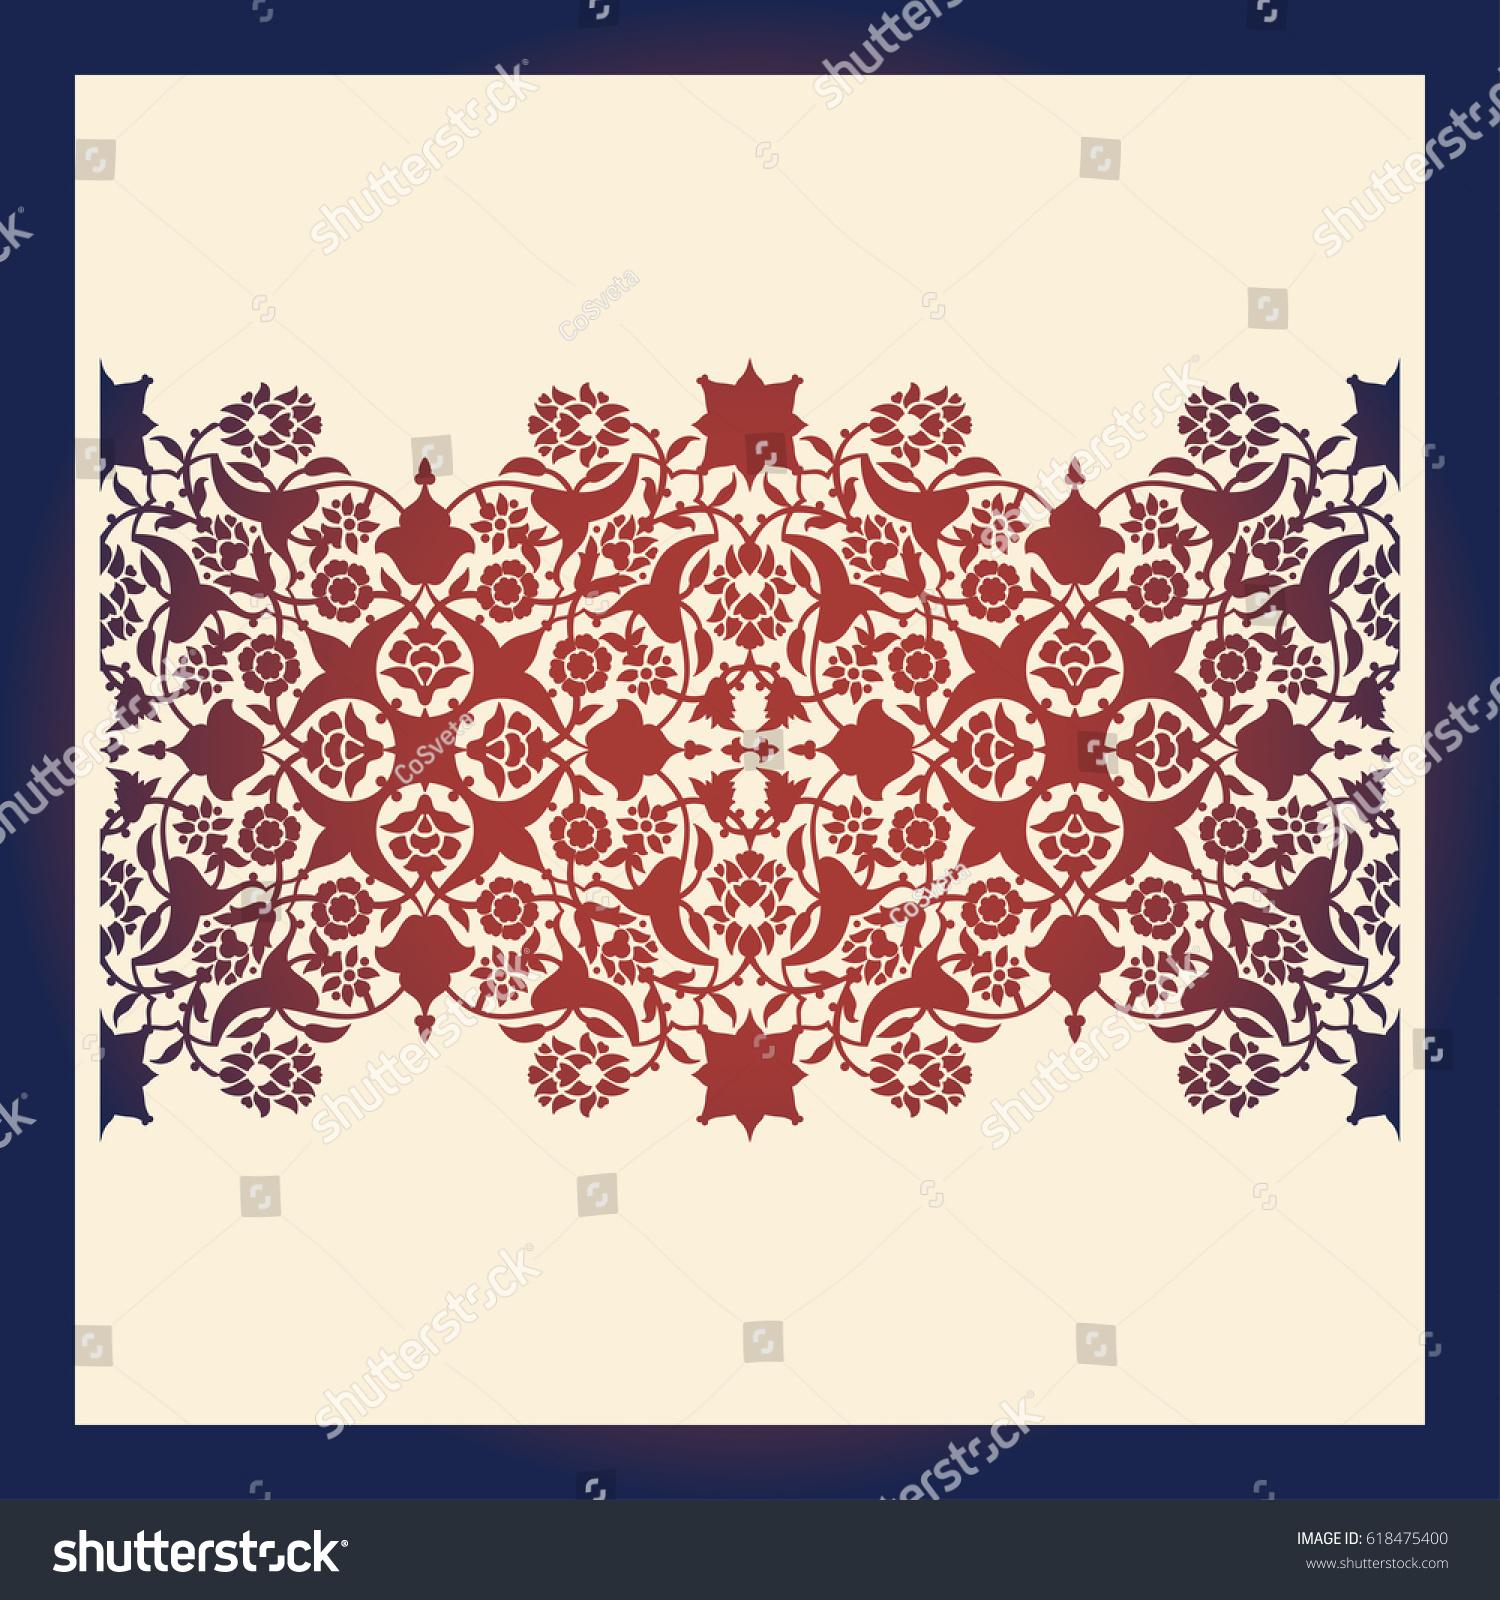 Laser Cut Floral Arabesque Ornament Pattern Stock Photo (Photo ...